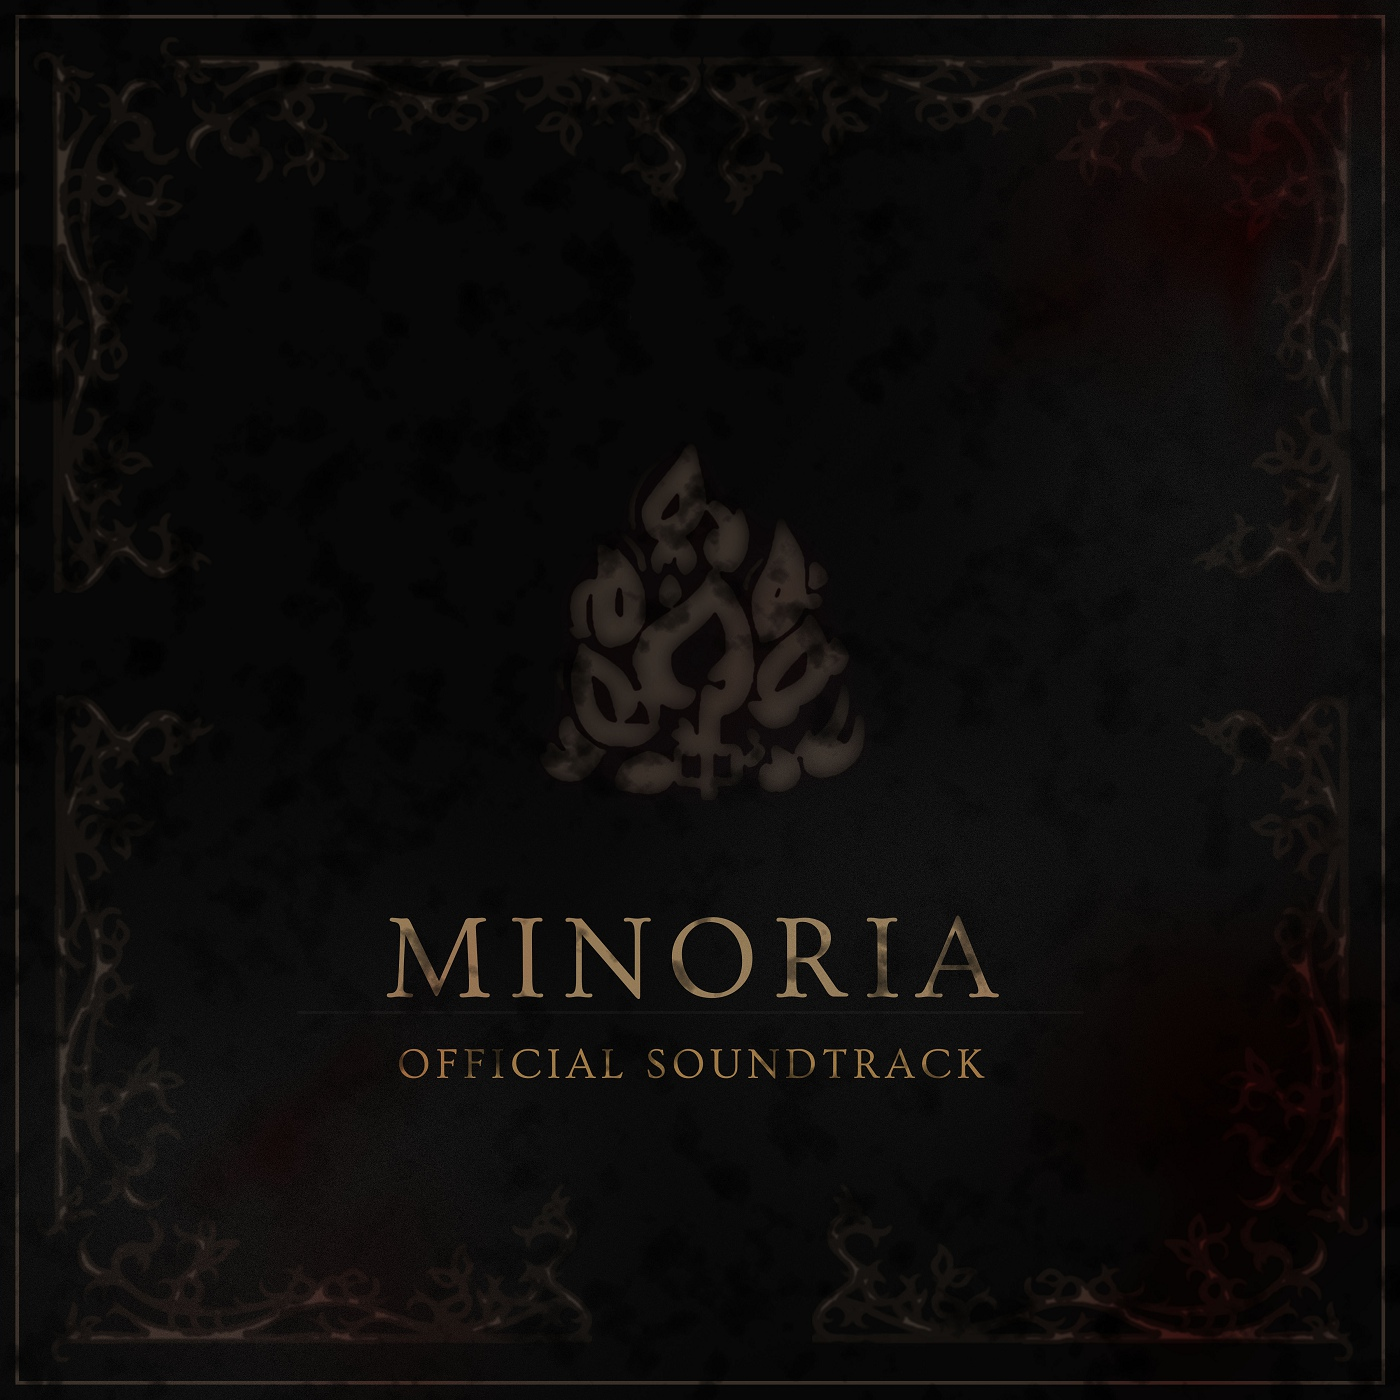 Minoria Official Soundtrack